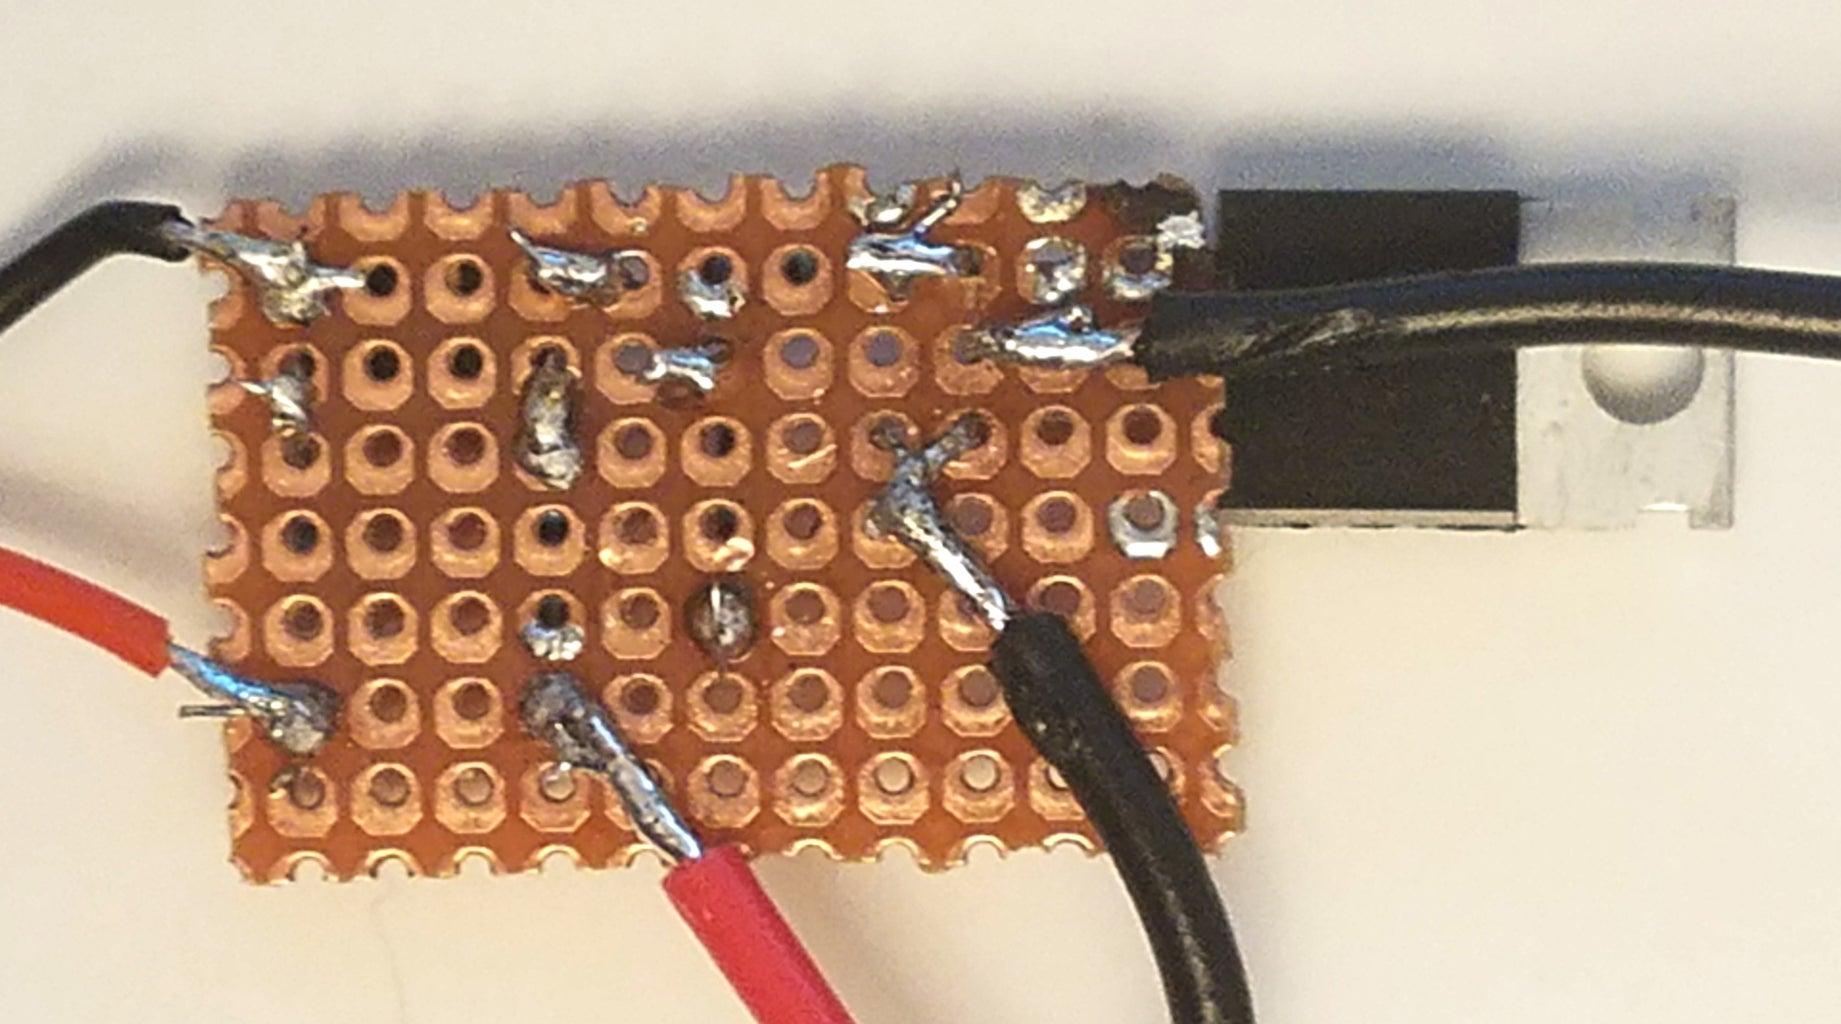 Assembling the MO1 Board Part 2